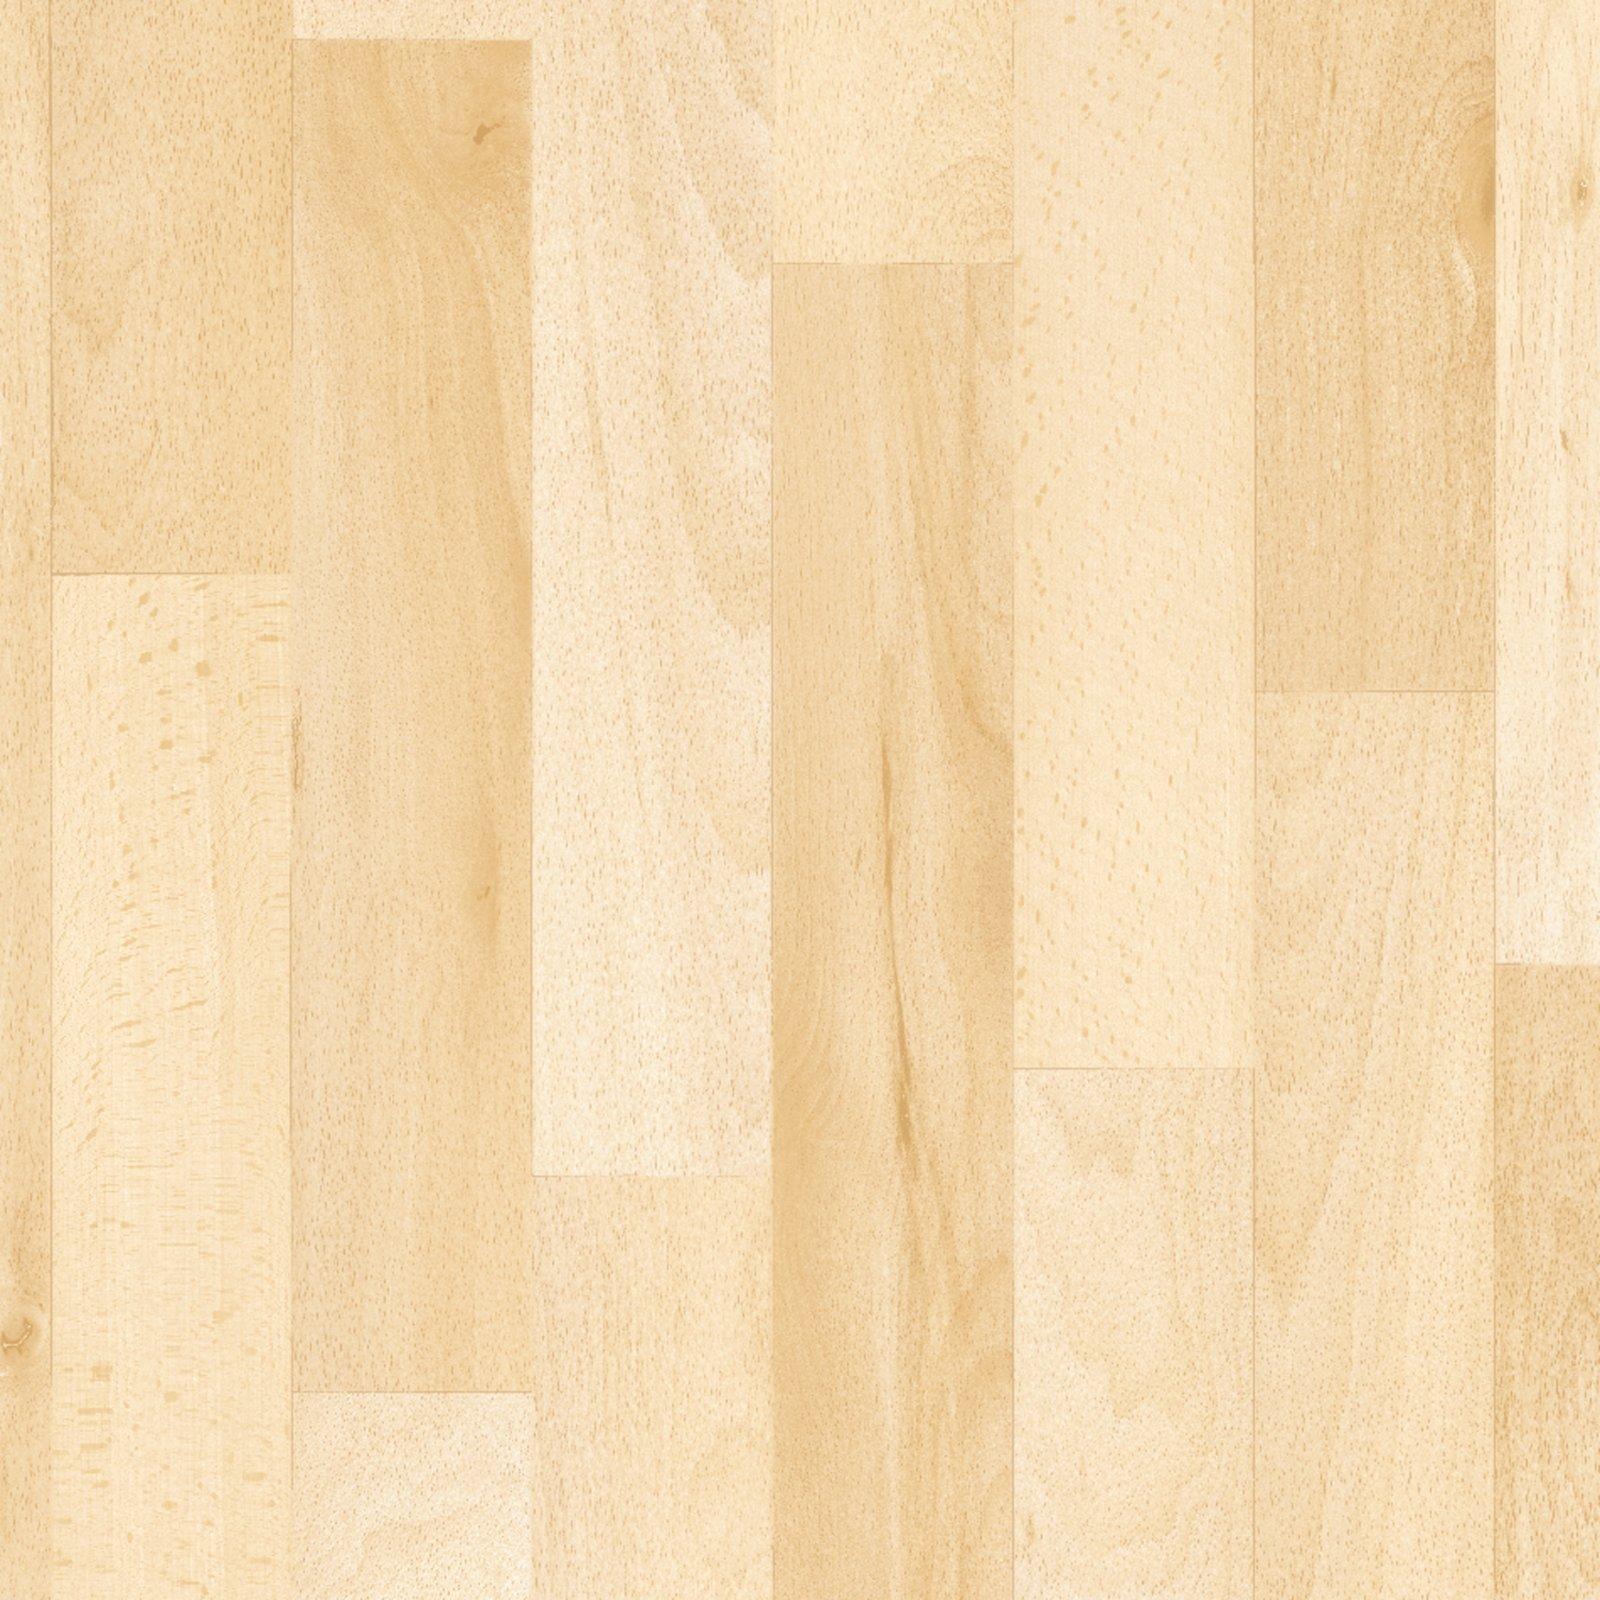 pvc parkett cool pvc parkett linoleum laminat parkett steinboden fliesen granit marmor with pvc. Black Bedroom Furniture Sets. Home Design Ideas